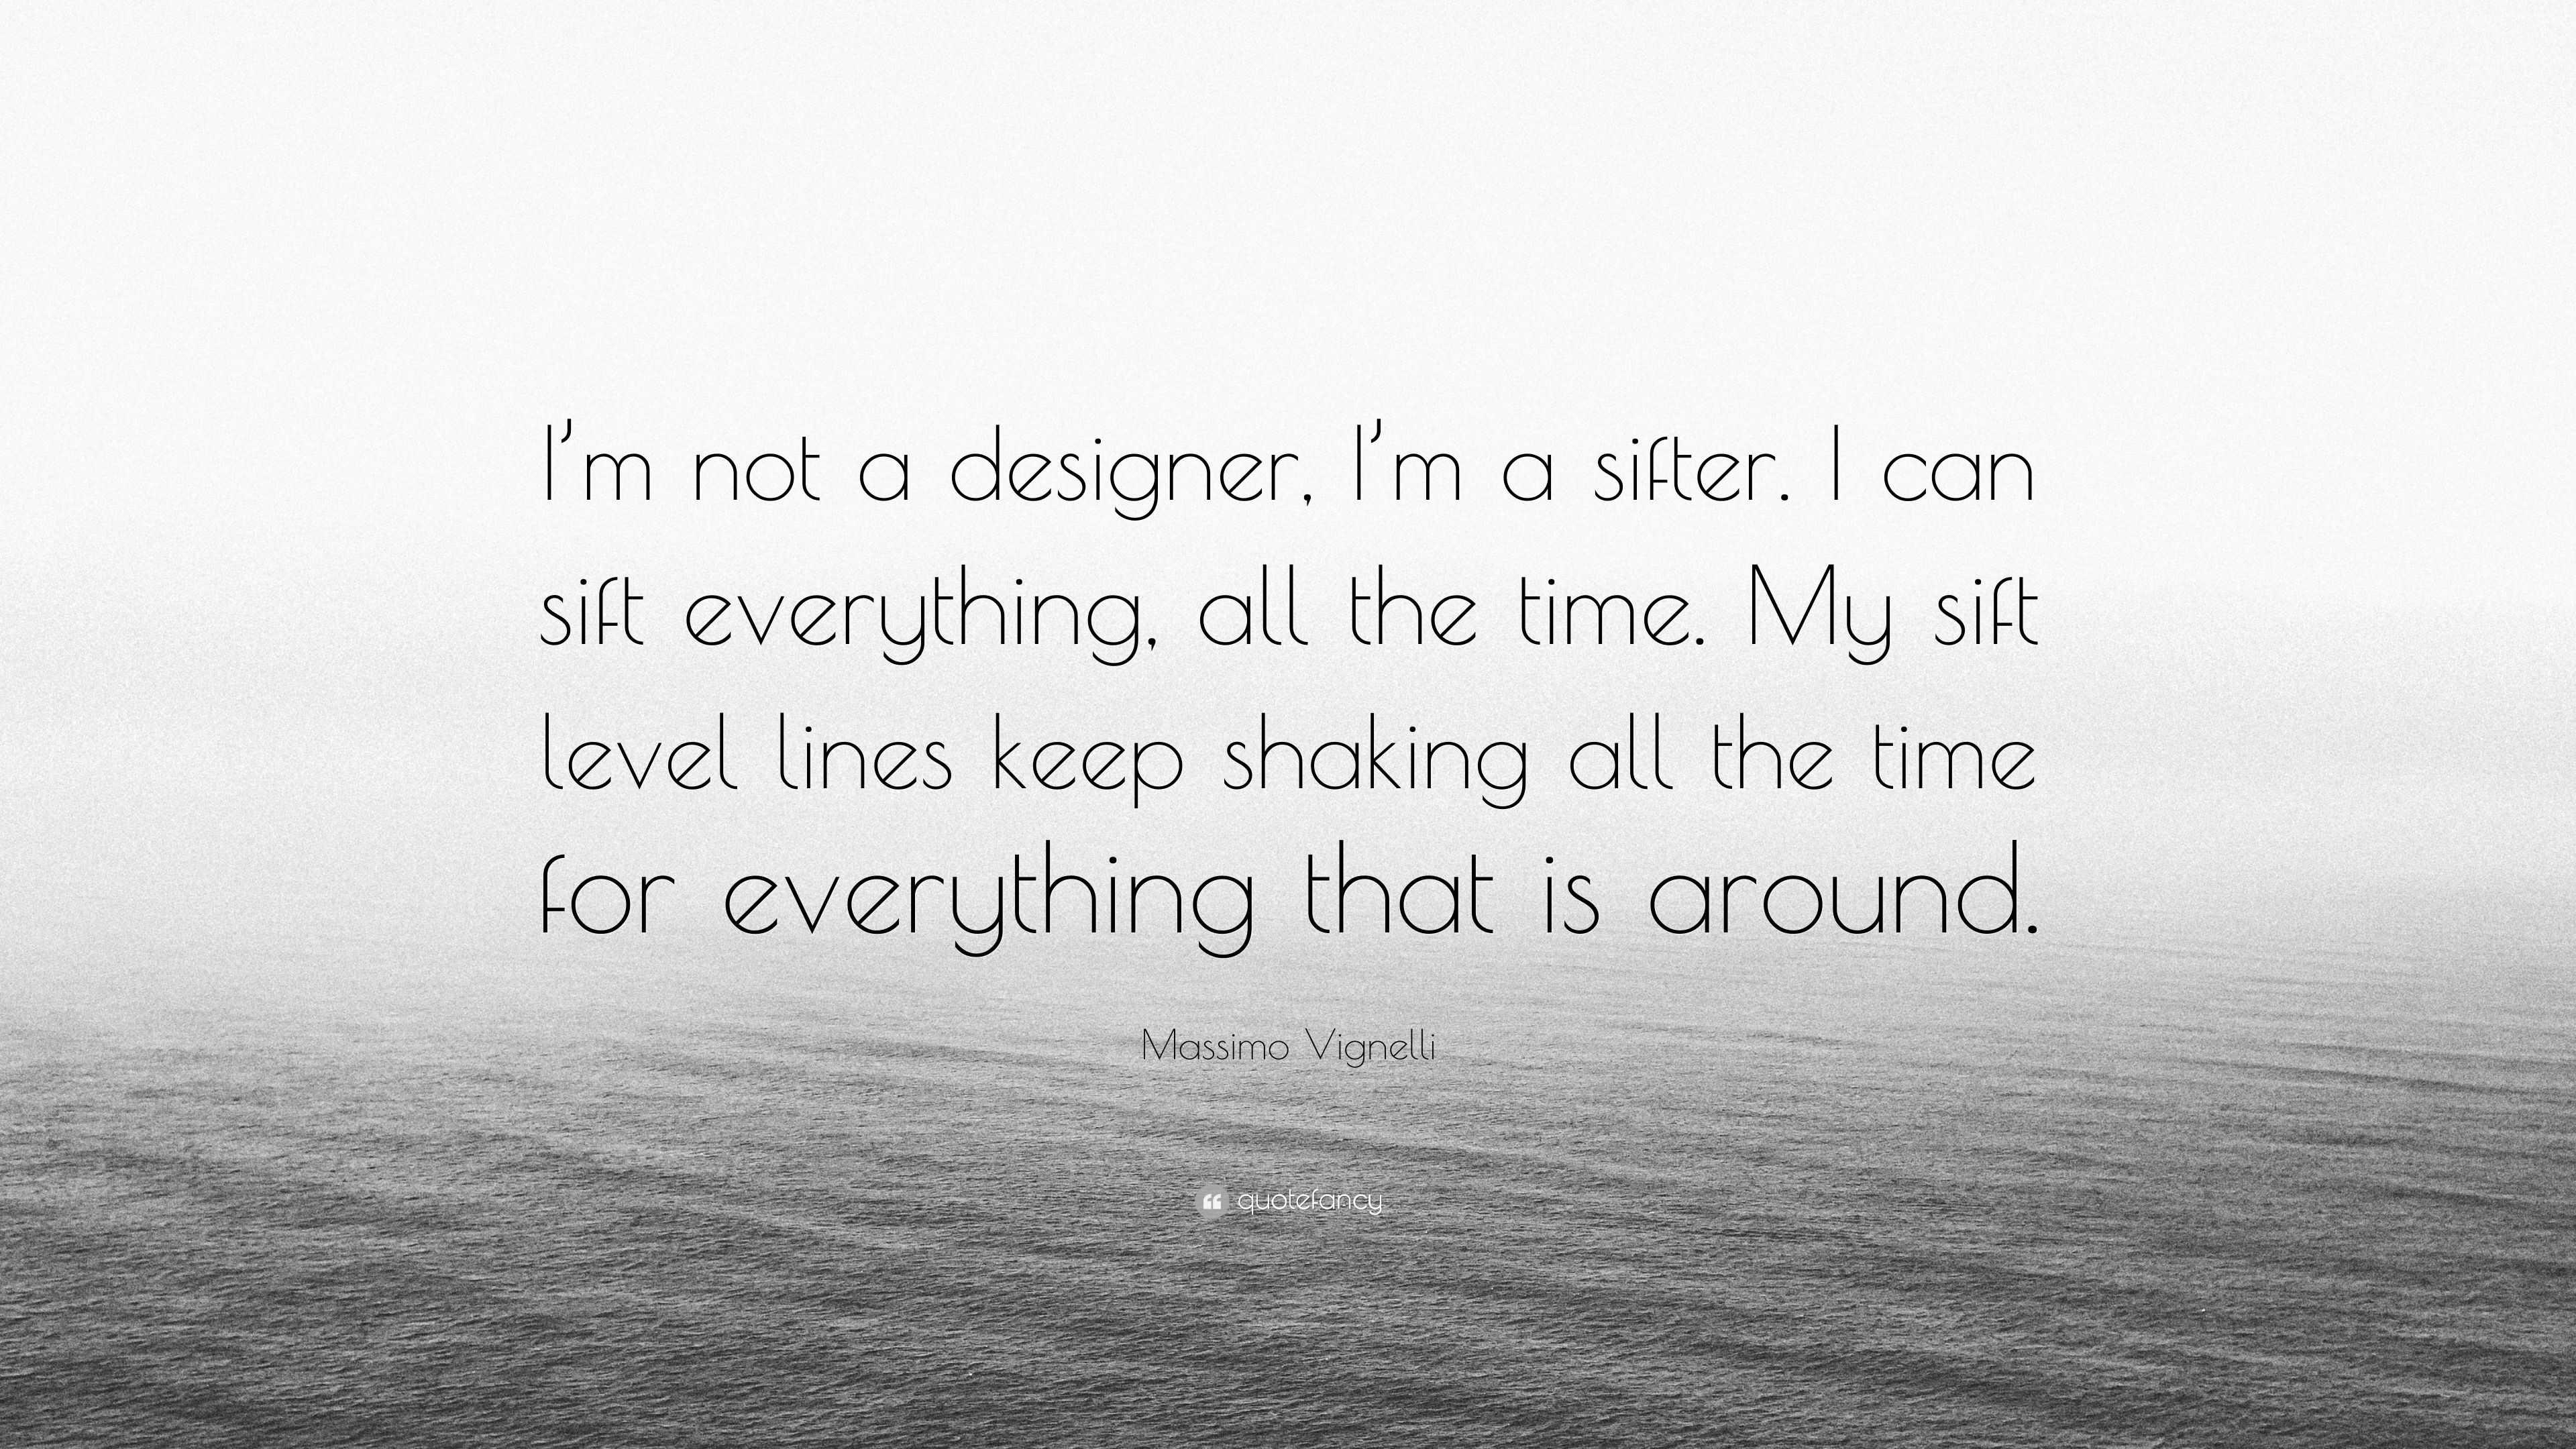 Designer Lines : Massimo vignelli quote: u201ci'm not a designer i'm sifter. i can